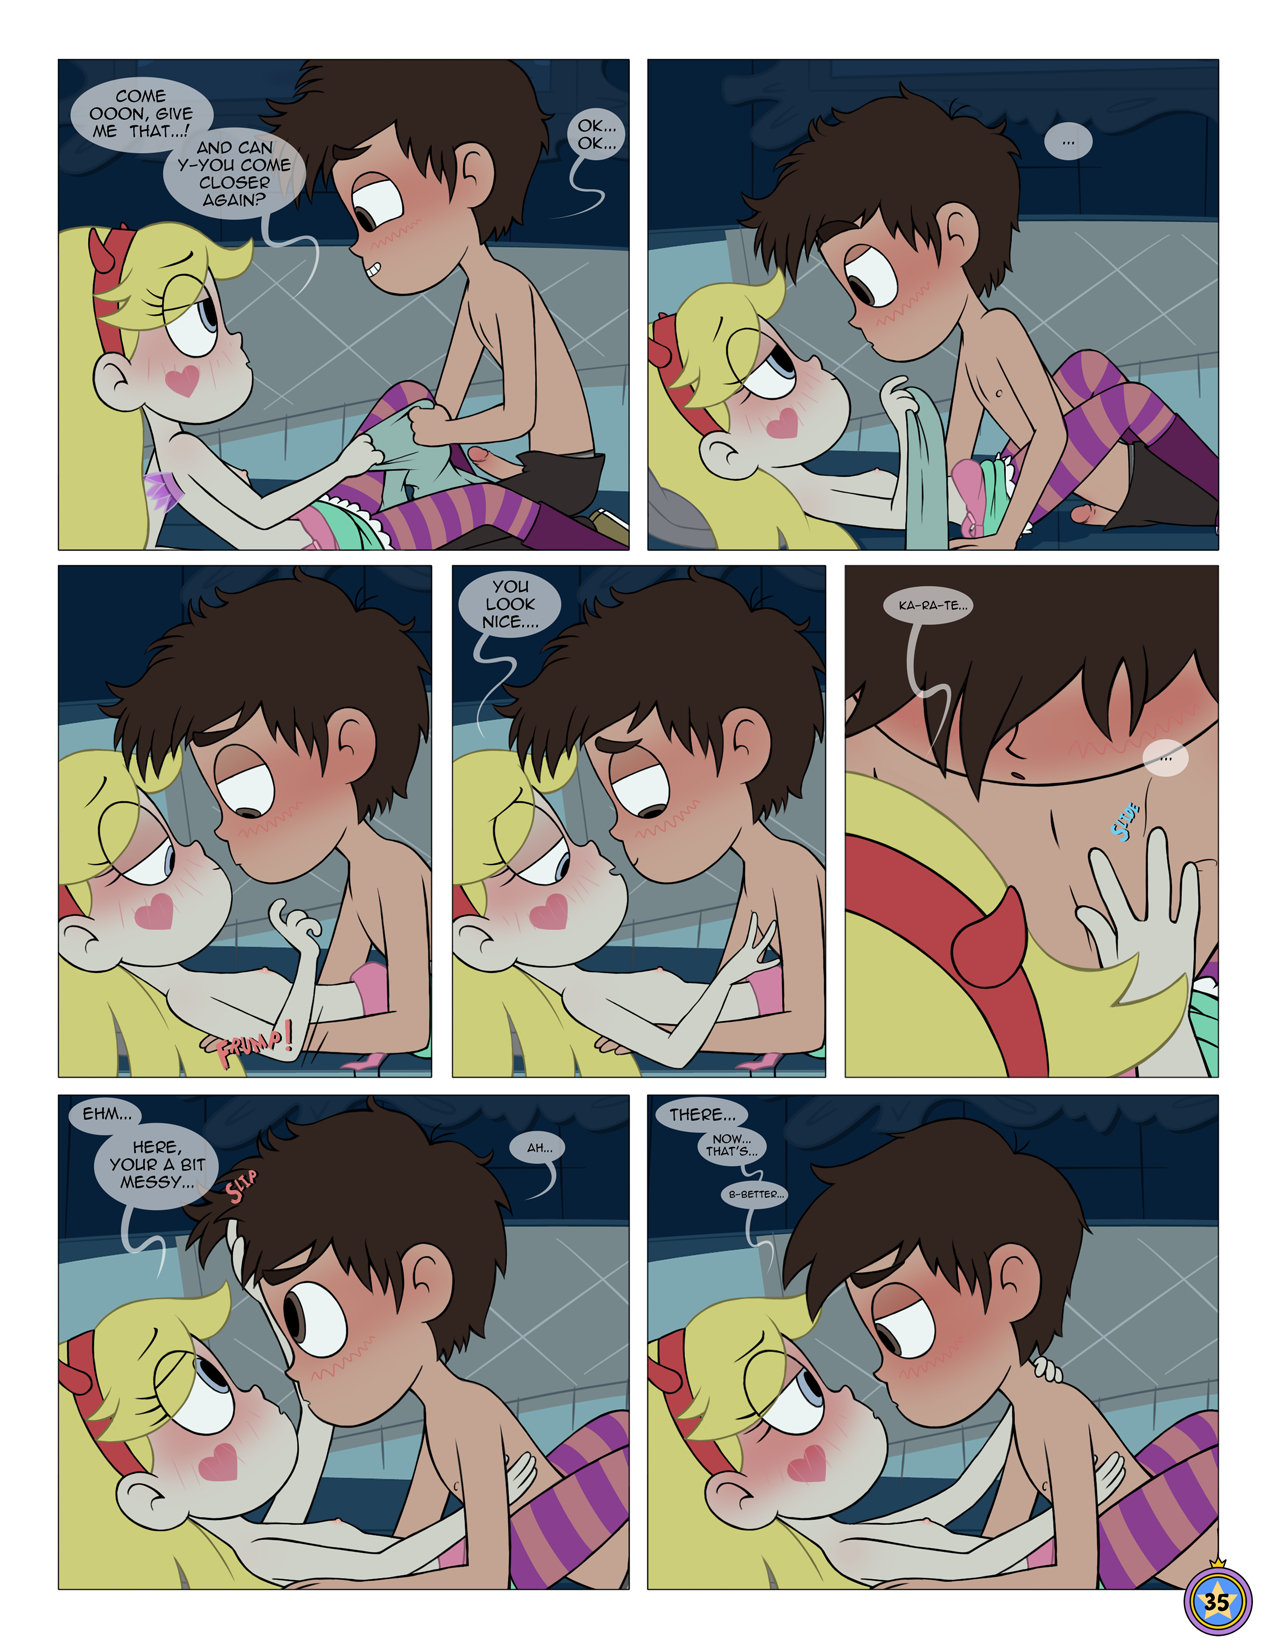 Between friends porn comic picture 036